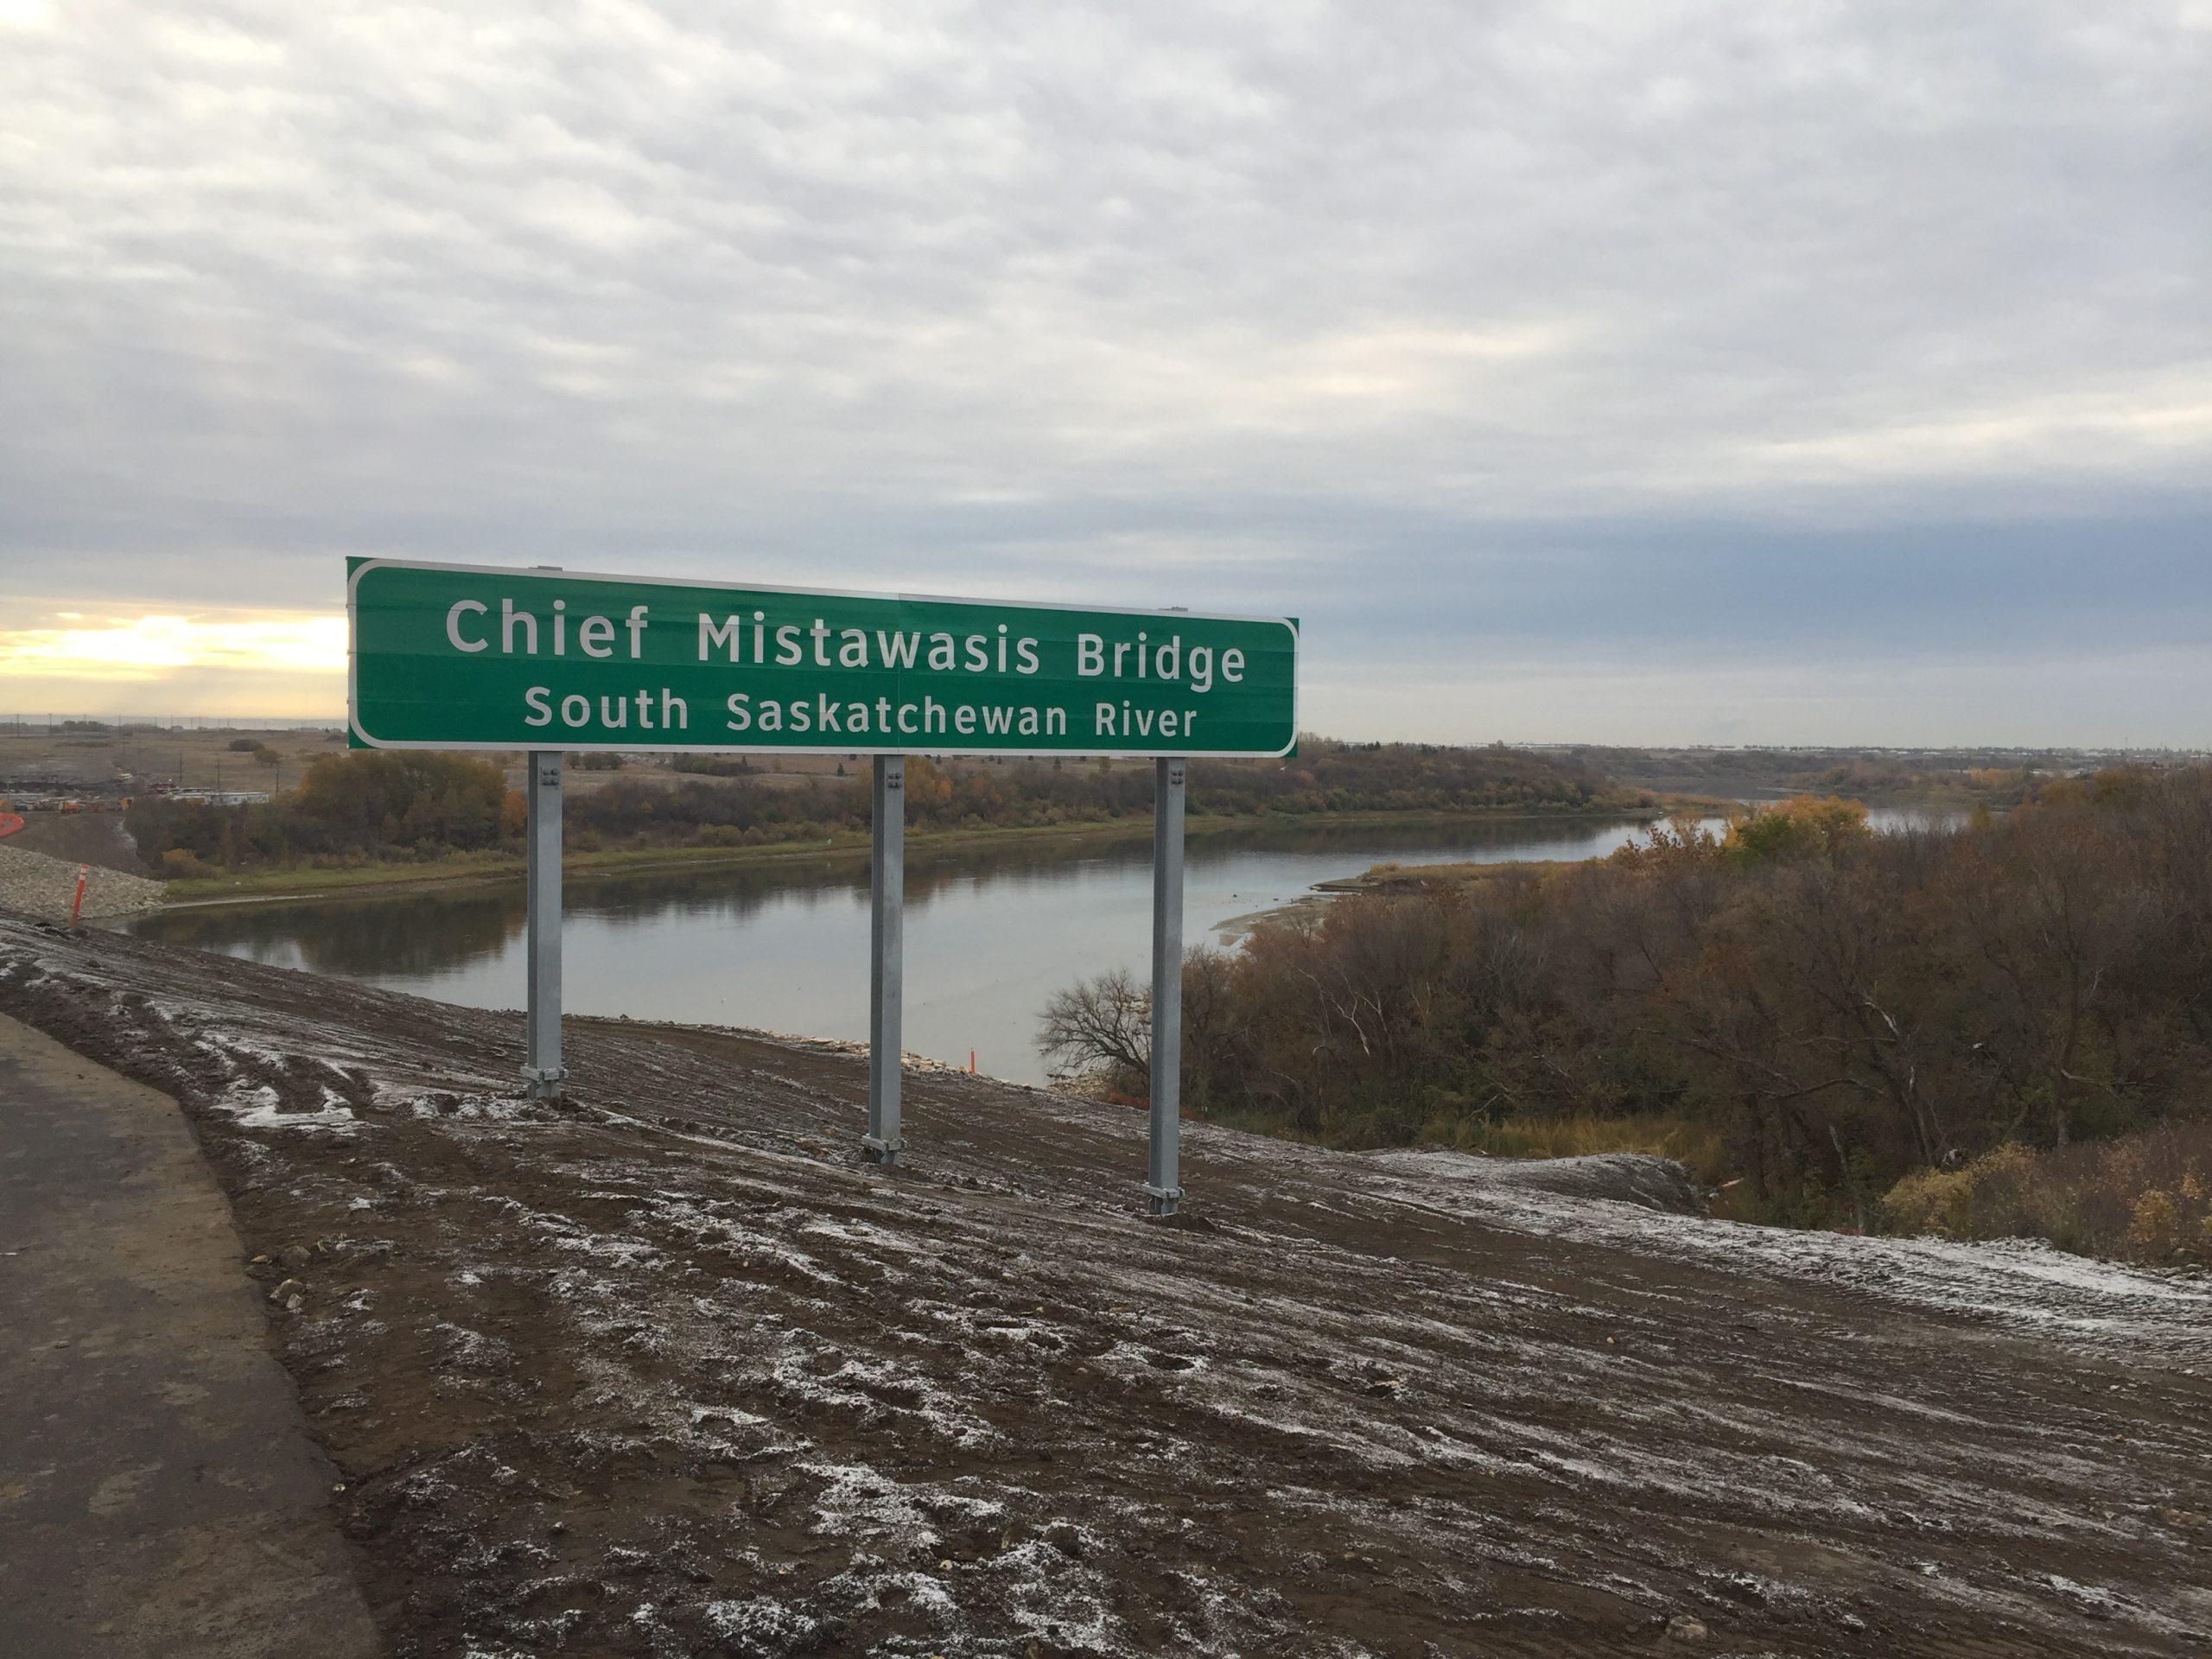 How Big of an Impact Will New Bridges Have on Saskatoon?